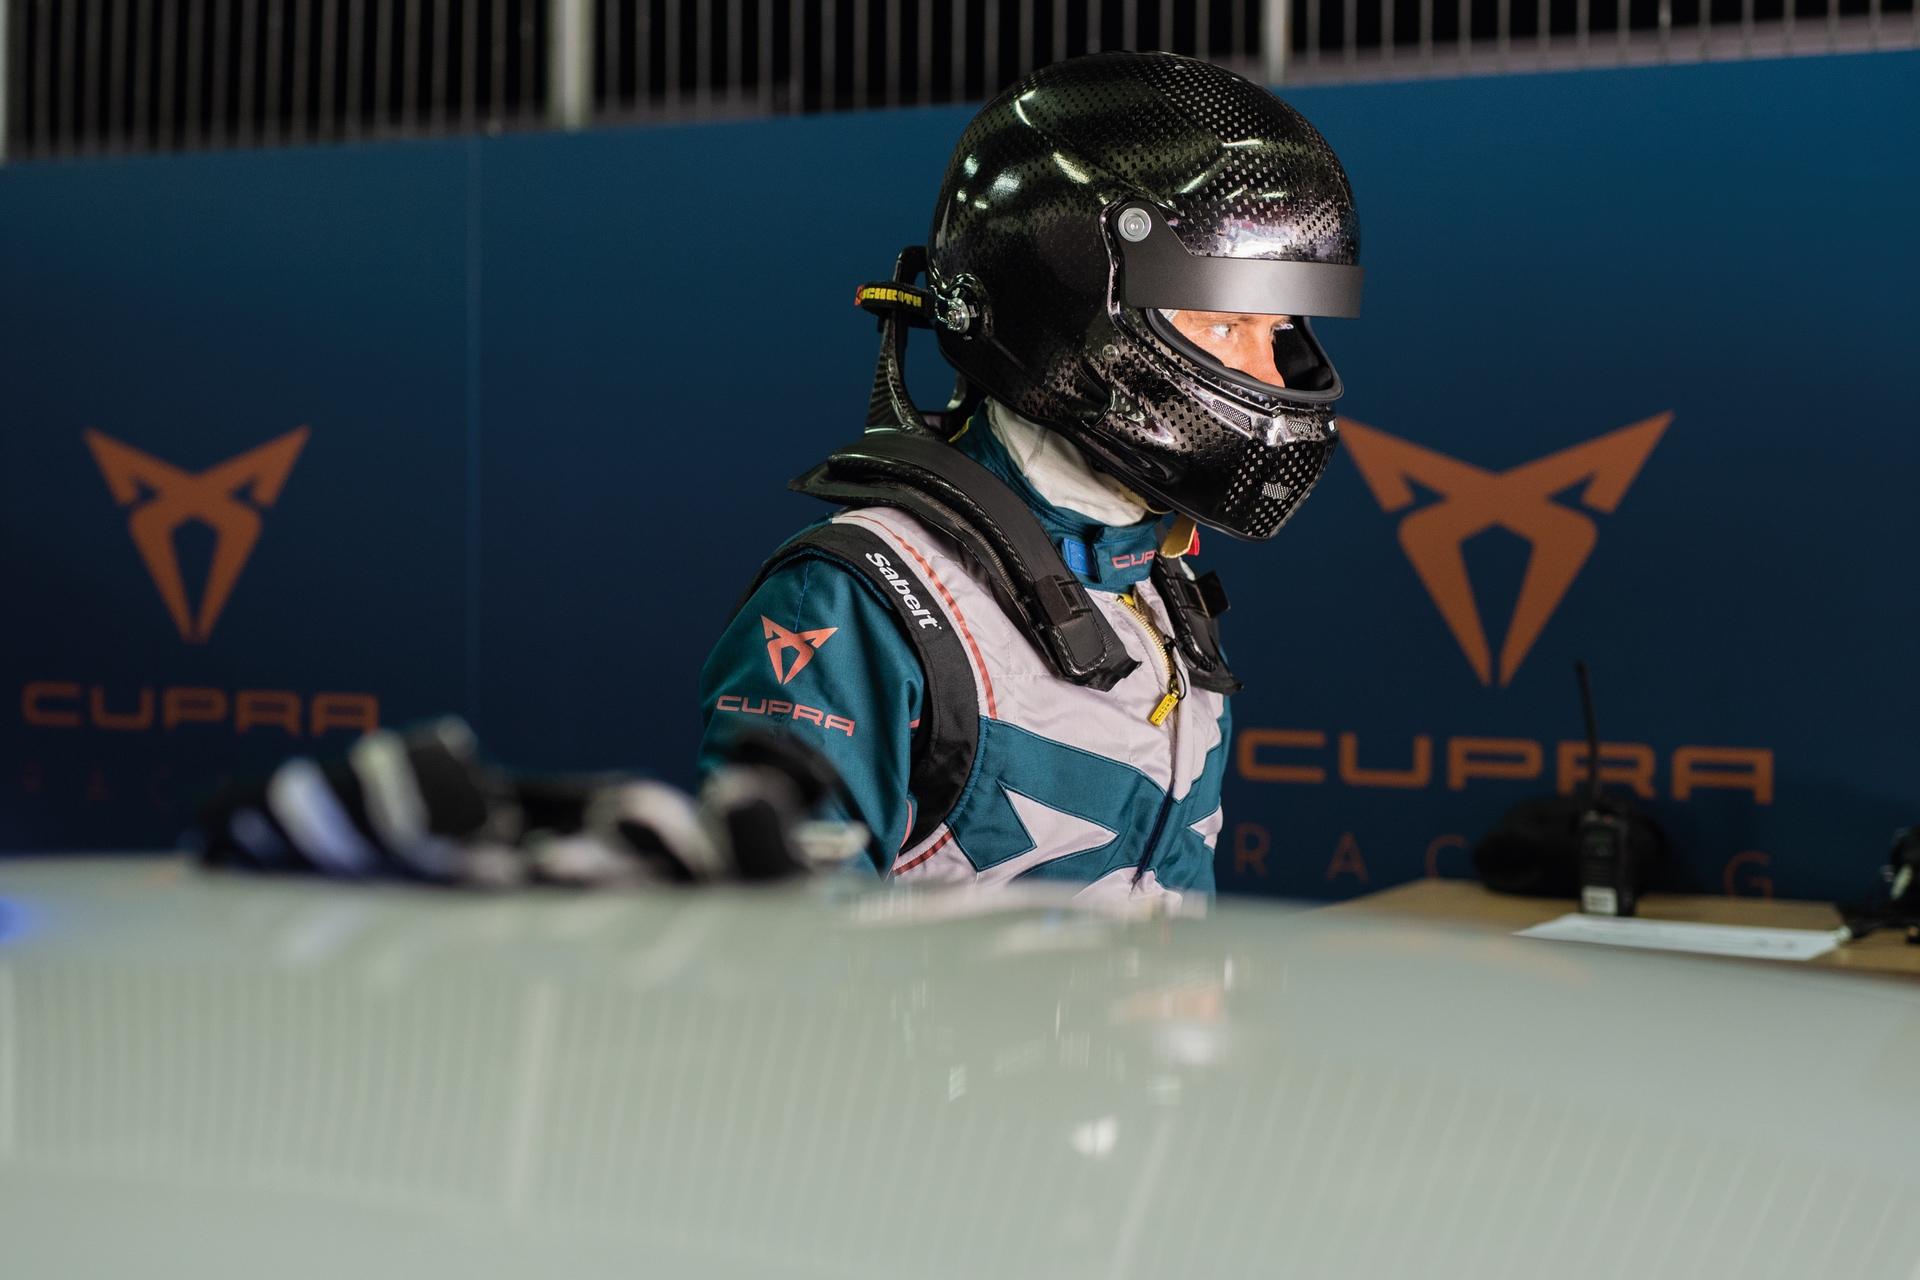 Mattias_Ekström_Cupra_e-Racer_0006